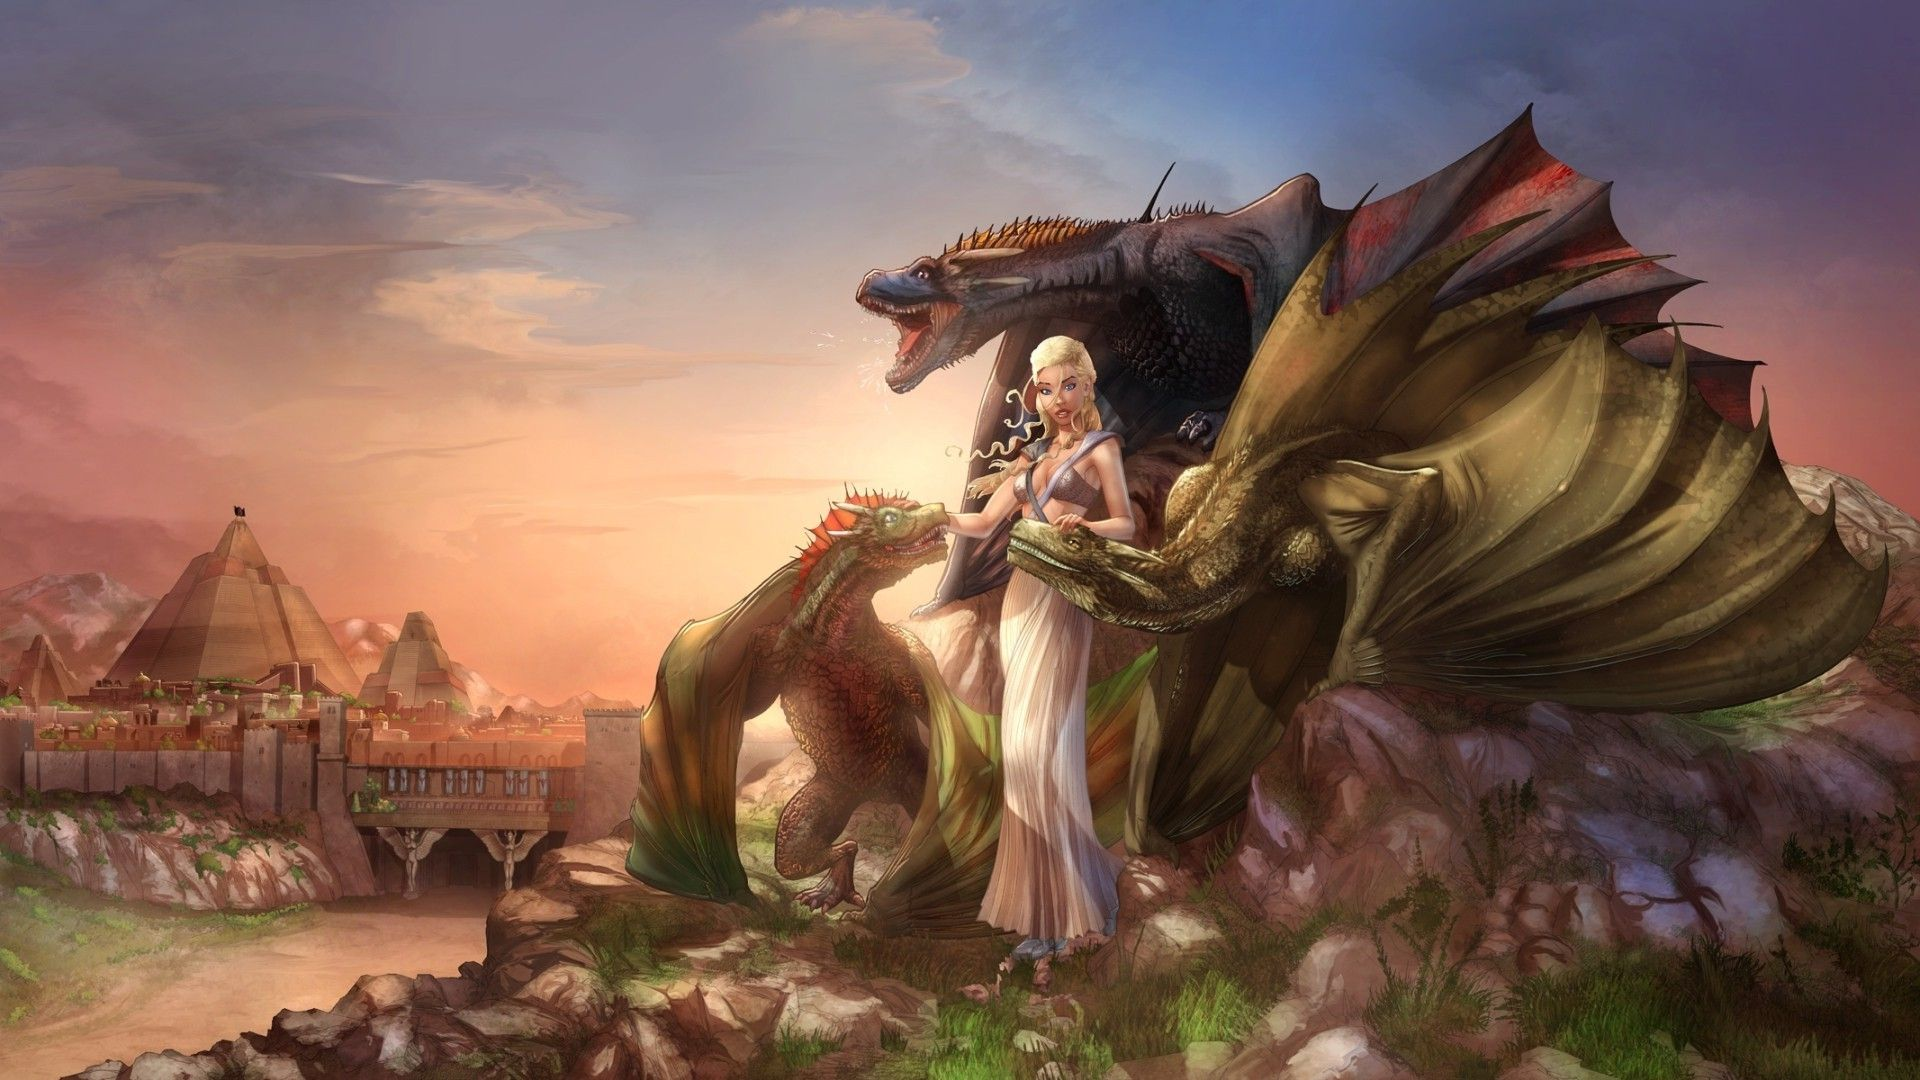 Game of Thrones Daenerys Targaryen with dragon fan art